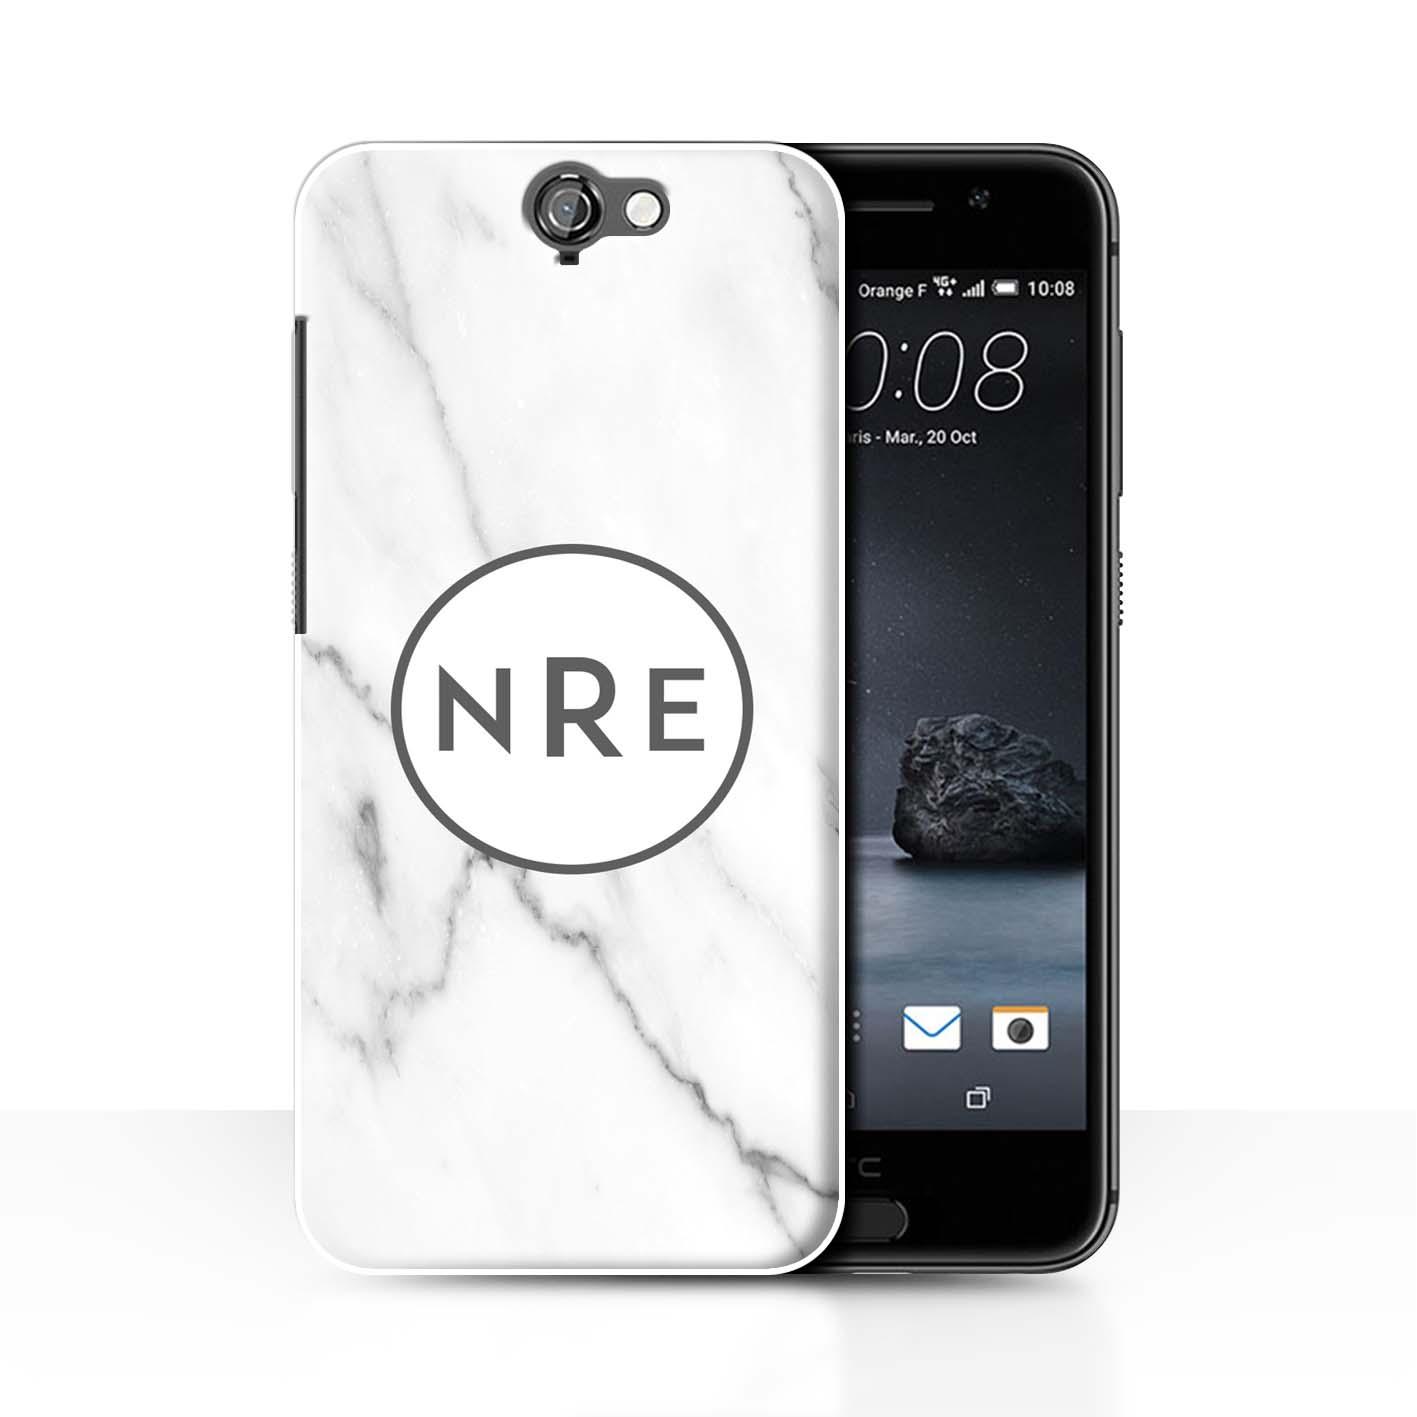 personnalise-Marbre-Granite-etui-pour-telePhone-coque-pour-HTC-One-Smartphone